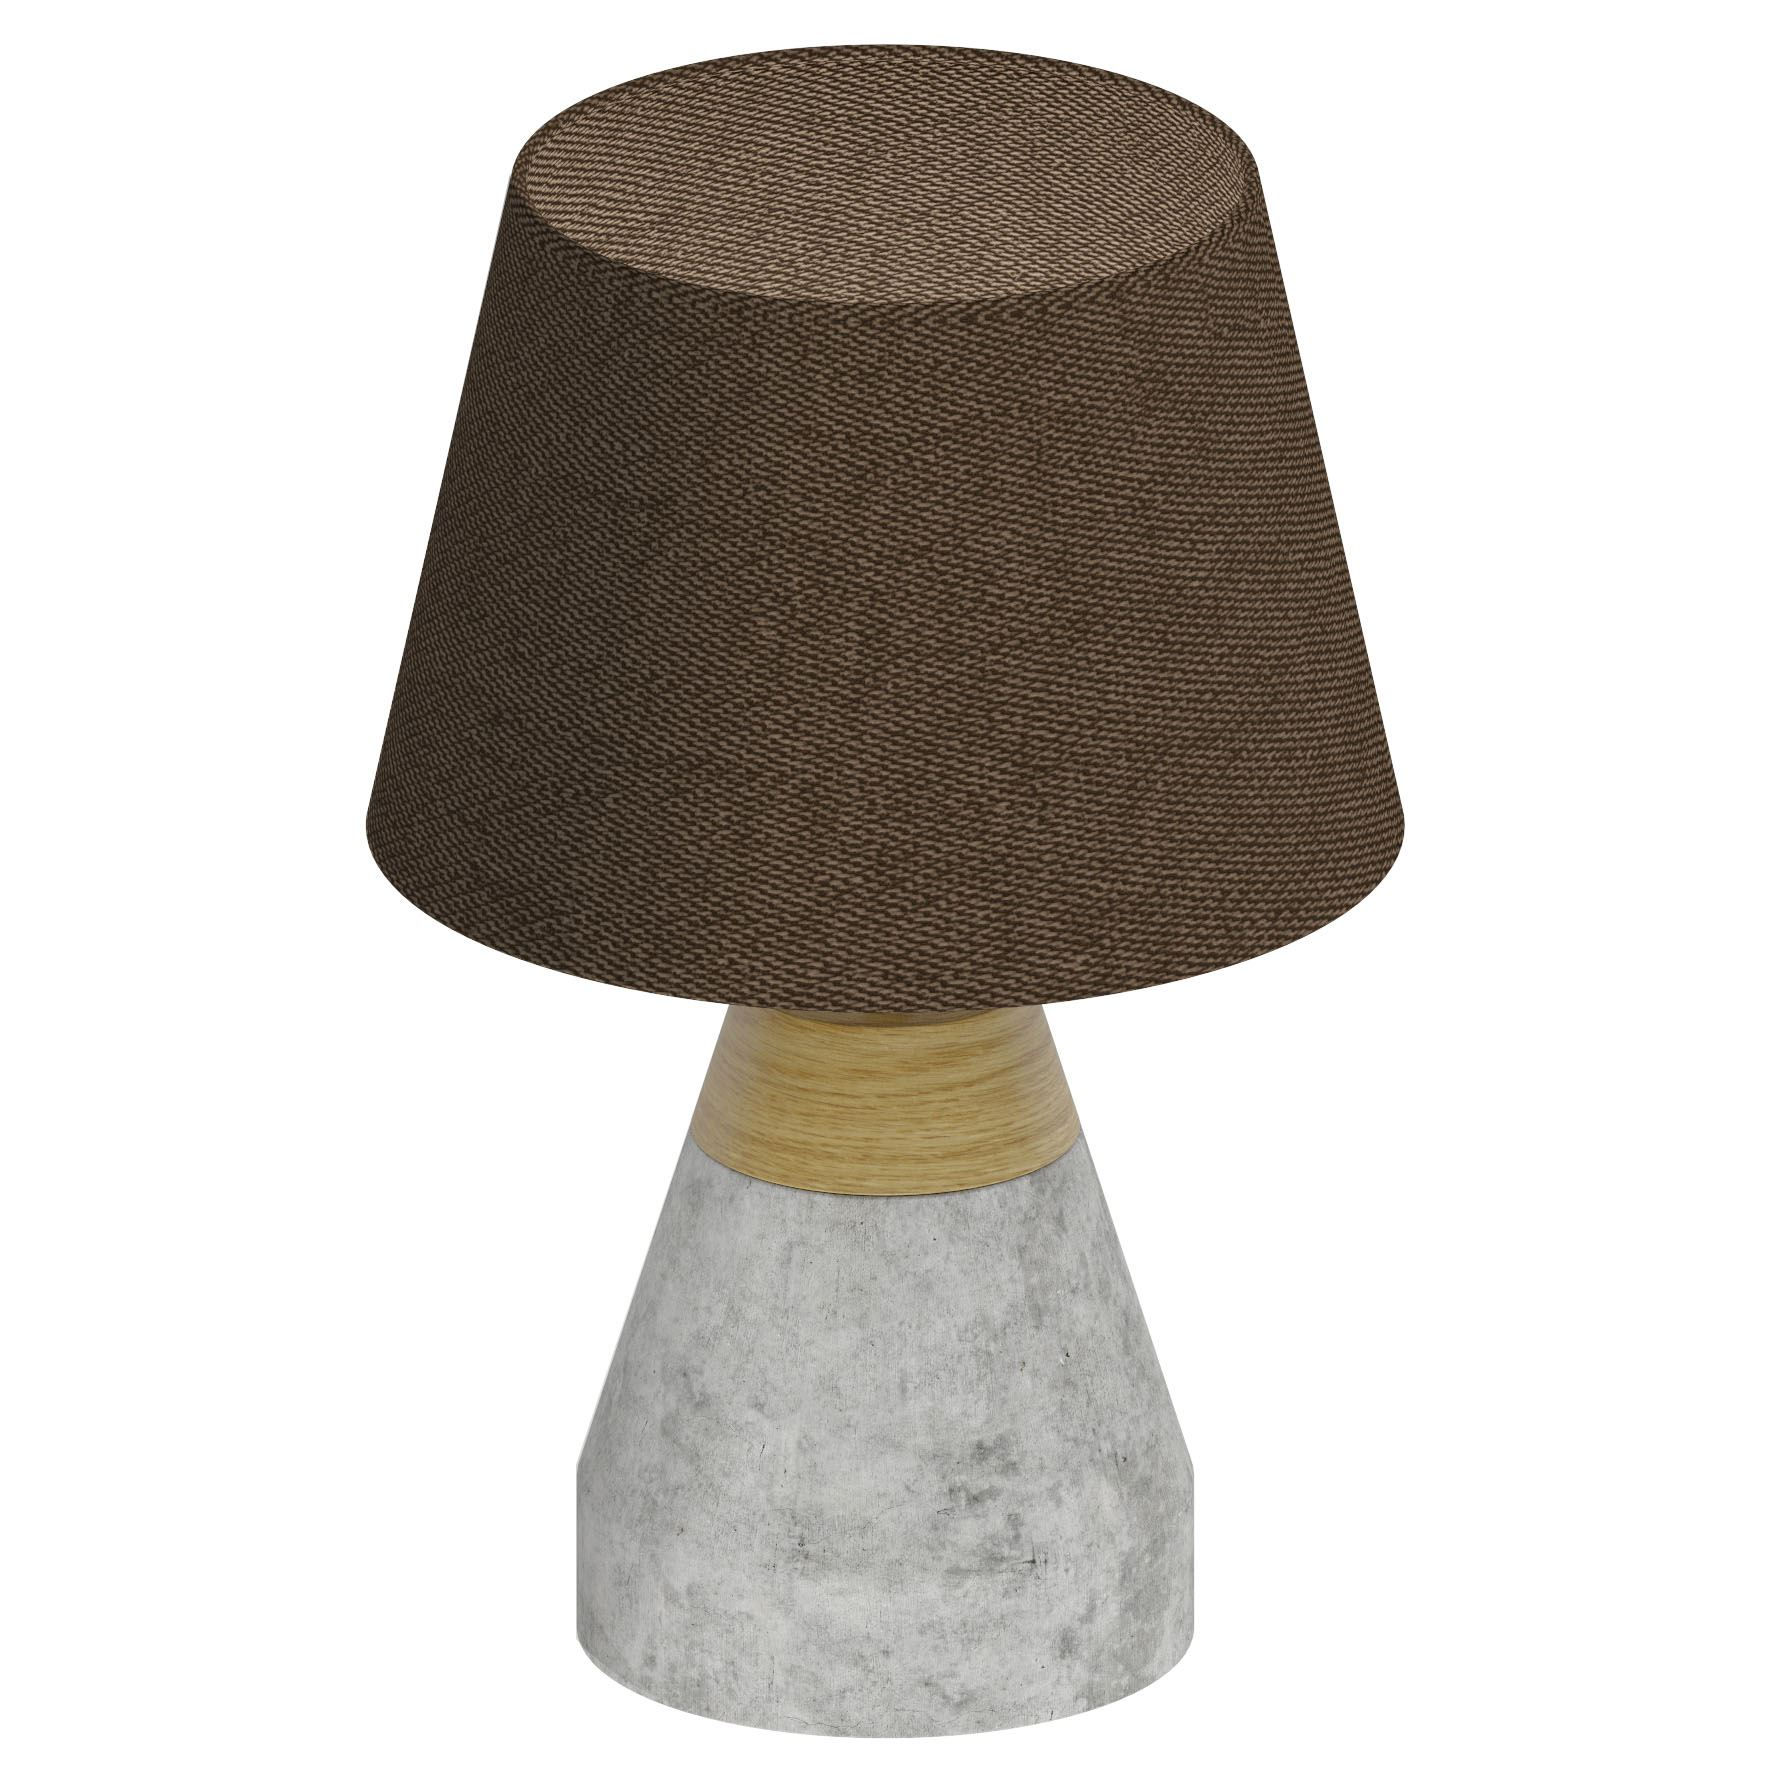 Tarega Table Lamp 1 Light Brown Concrete